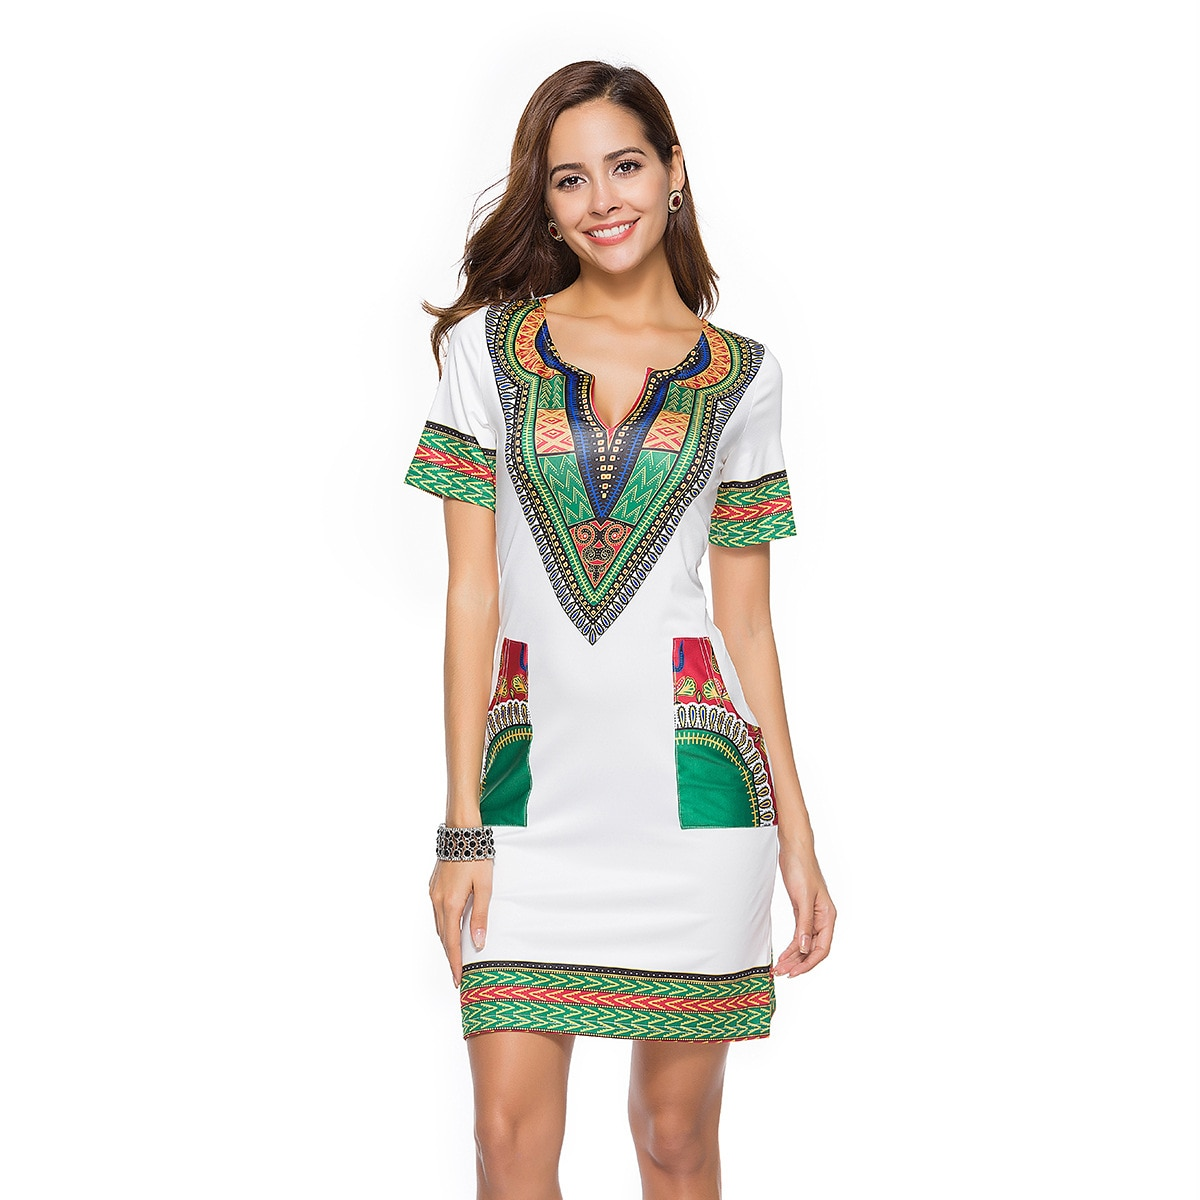 Summer Dress Women Tight Ethnic Style Print Sexy Slim Vestidos Vintage Lantern Sleeve Casual Party Robe Femme